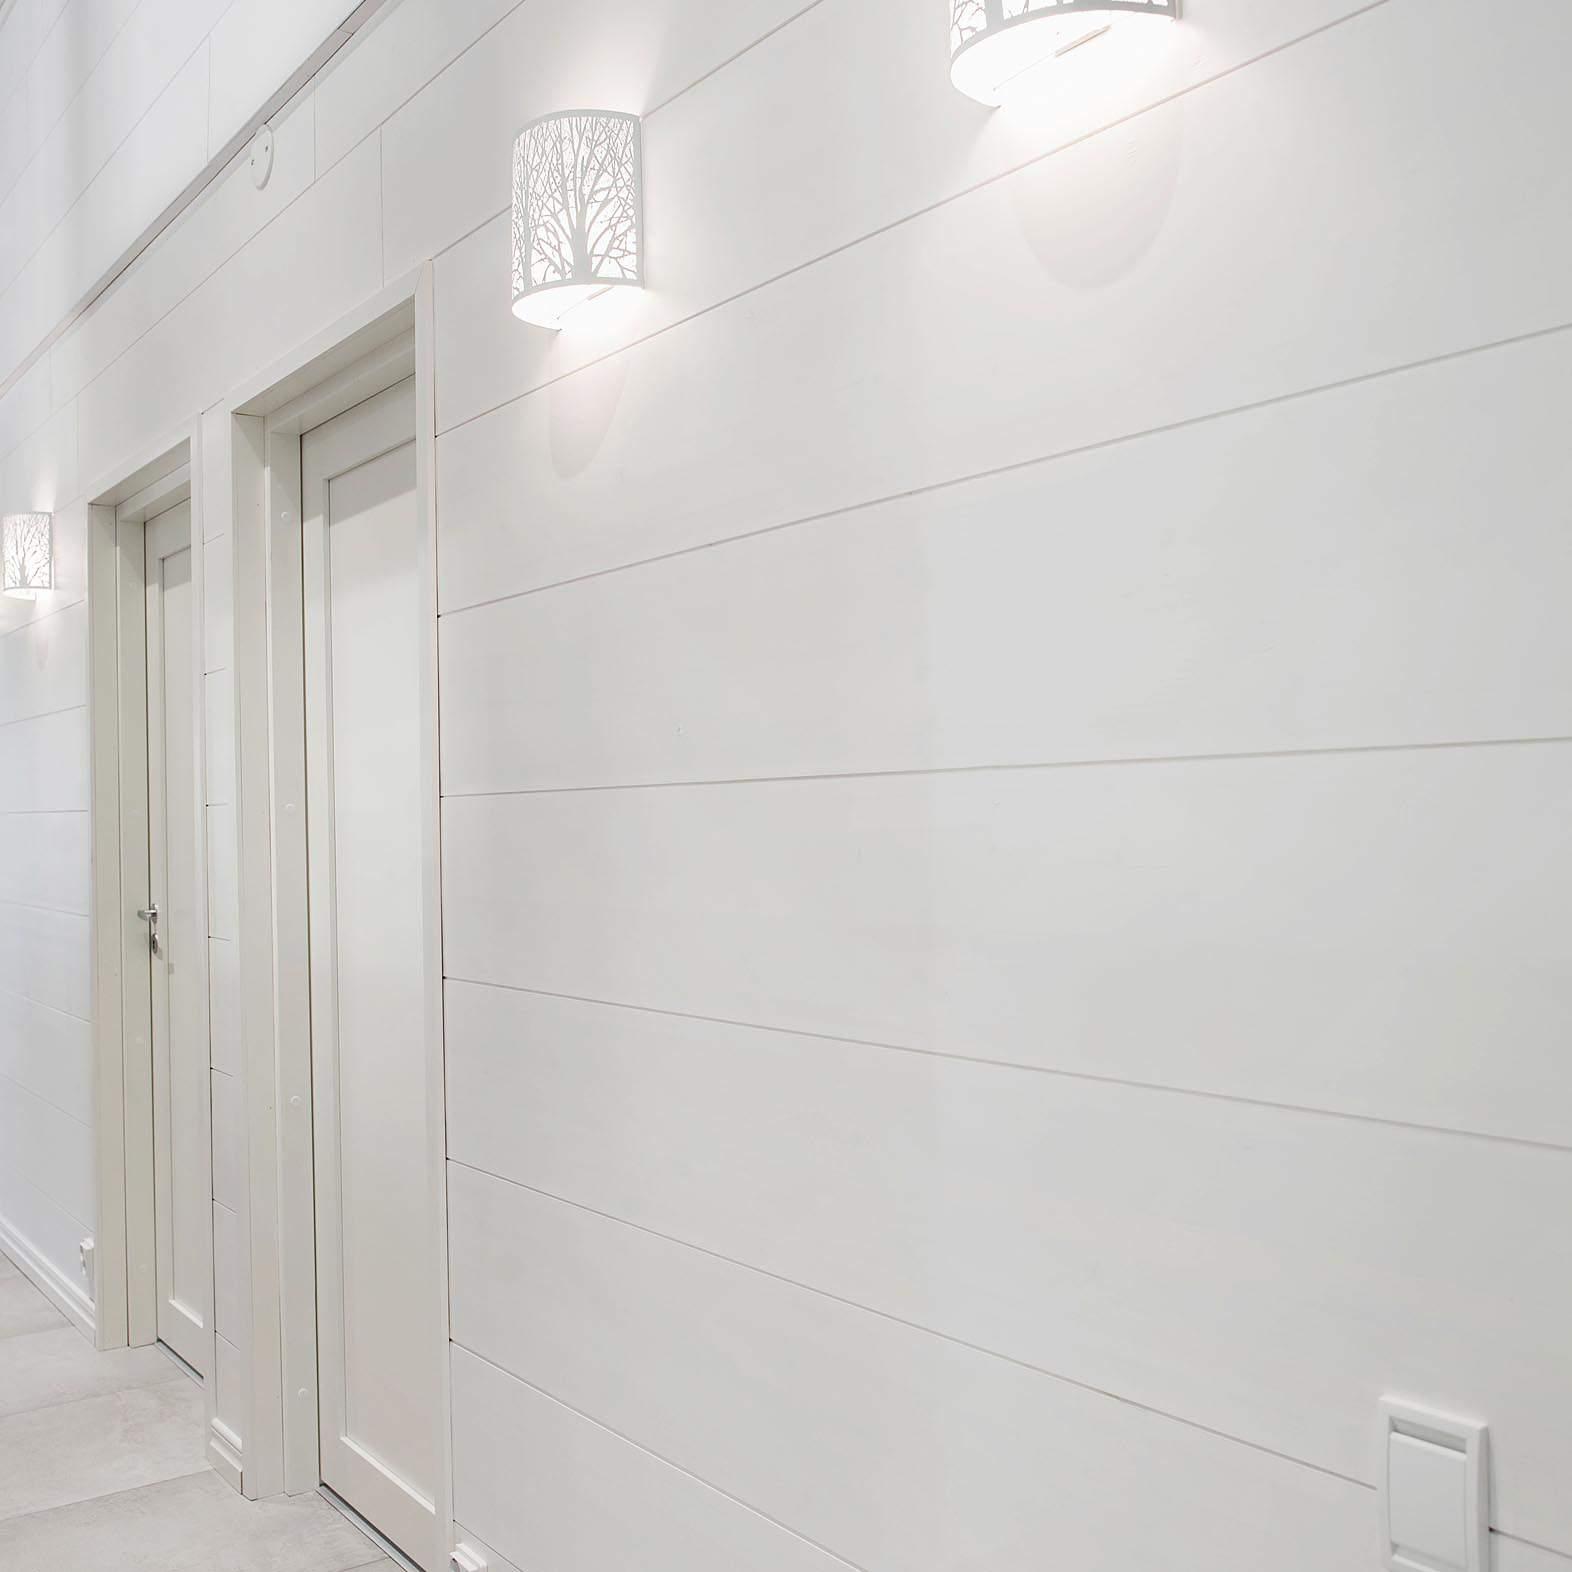 Siparila AITO-sisustuslevy 12x280, valkoinen, Vesanka